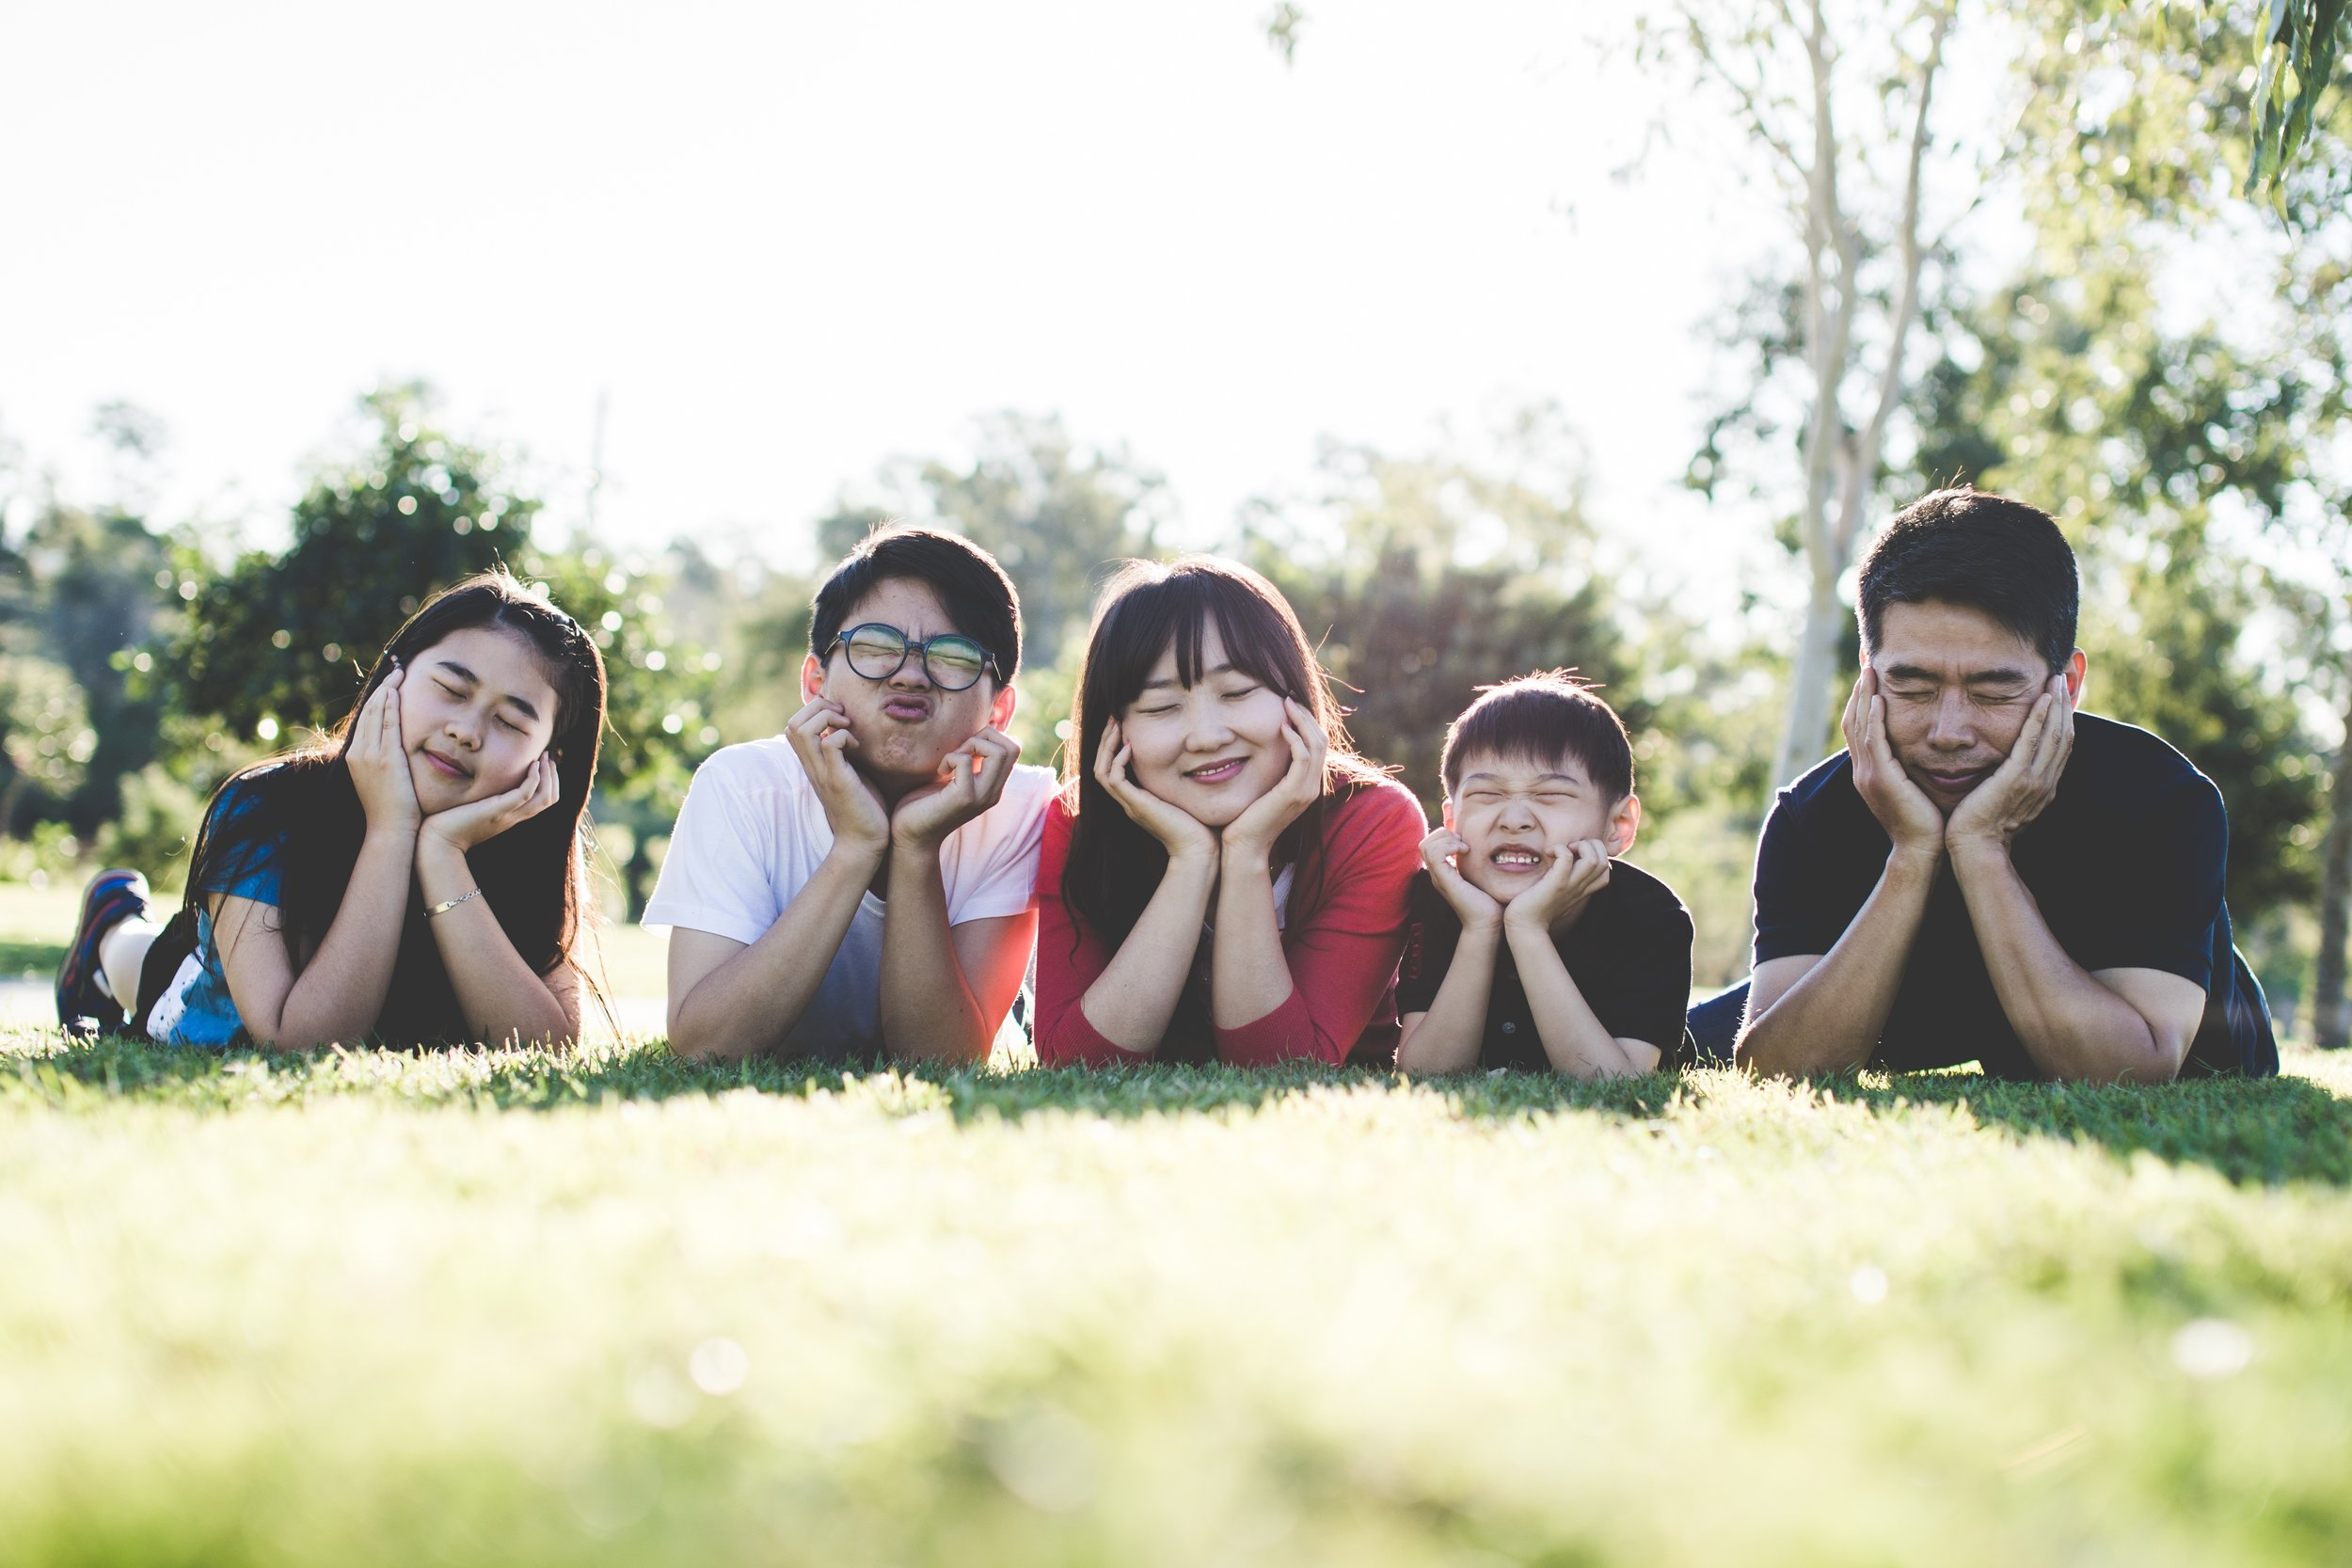 family-outdoor-happy-happiness-160994.jpg